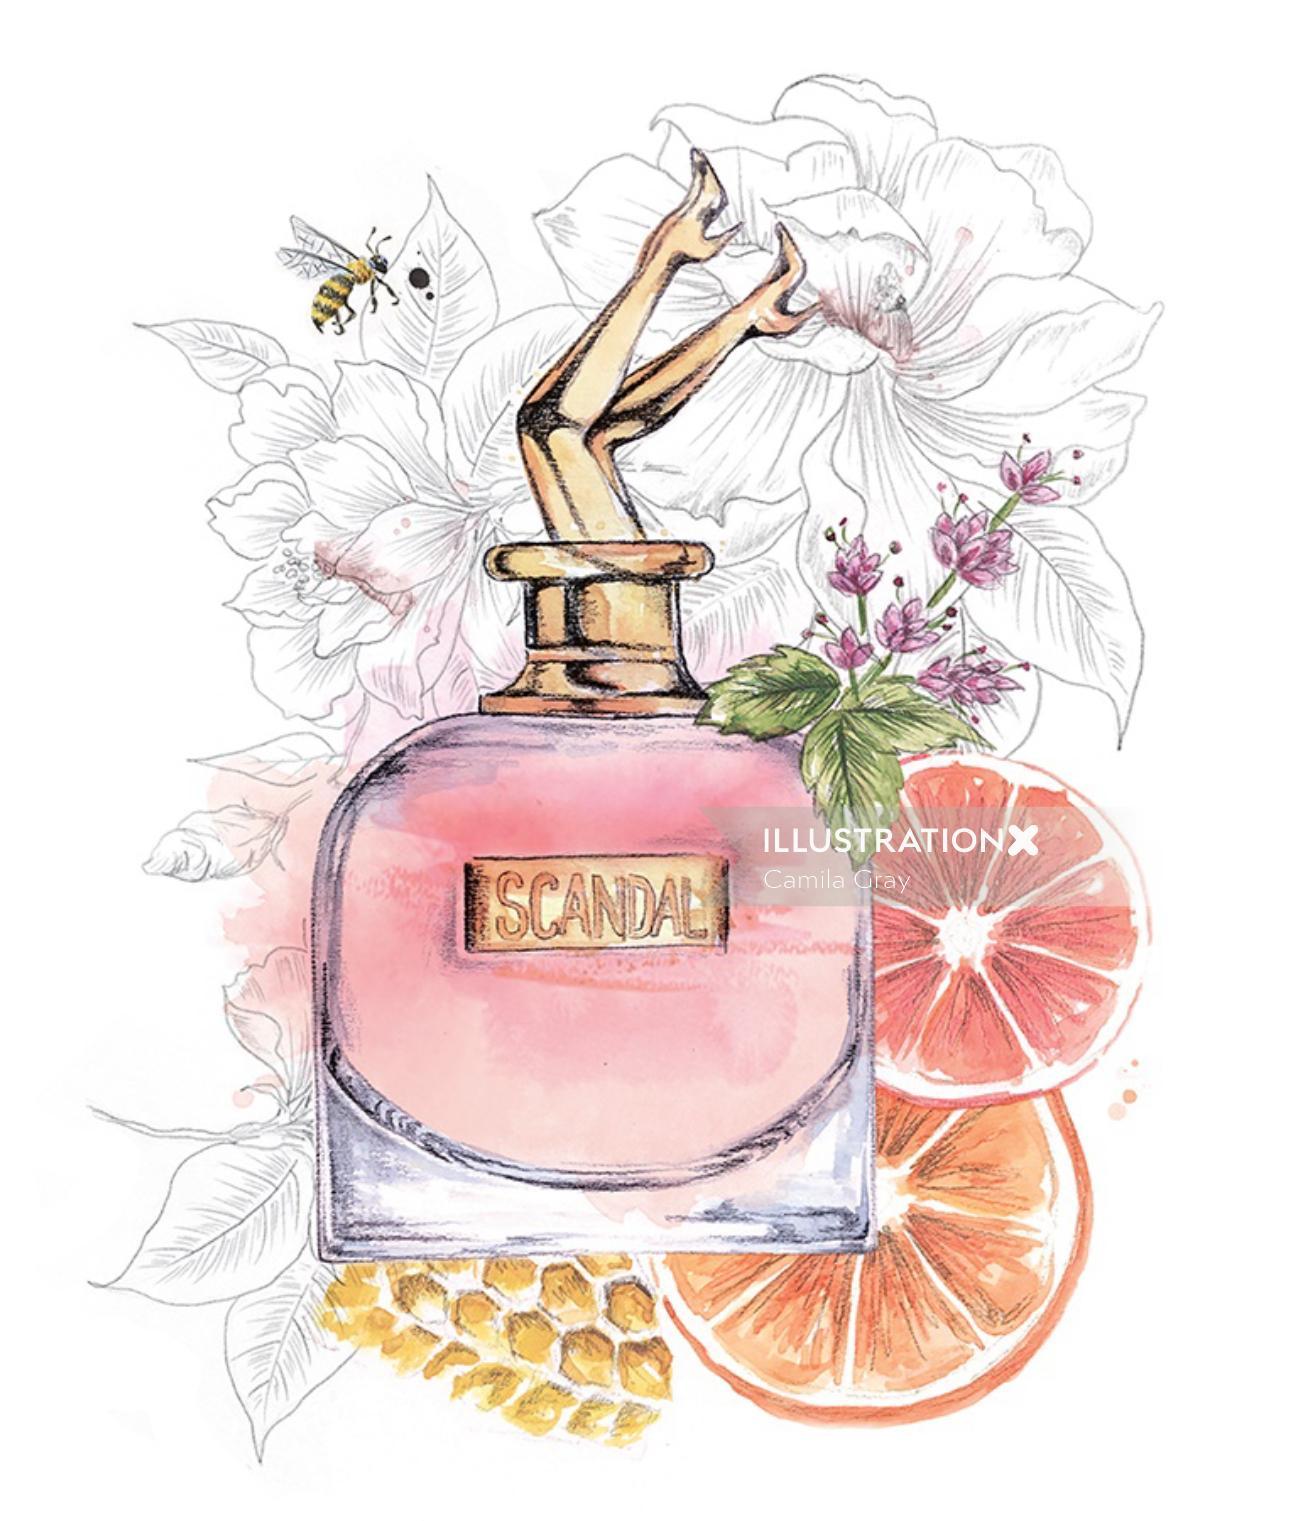 Decorative illustration for Scandal's perfume bottle